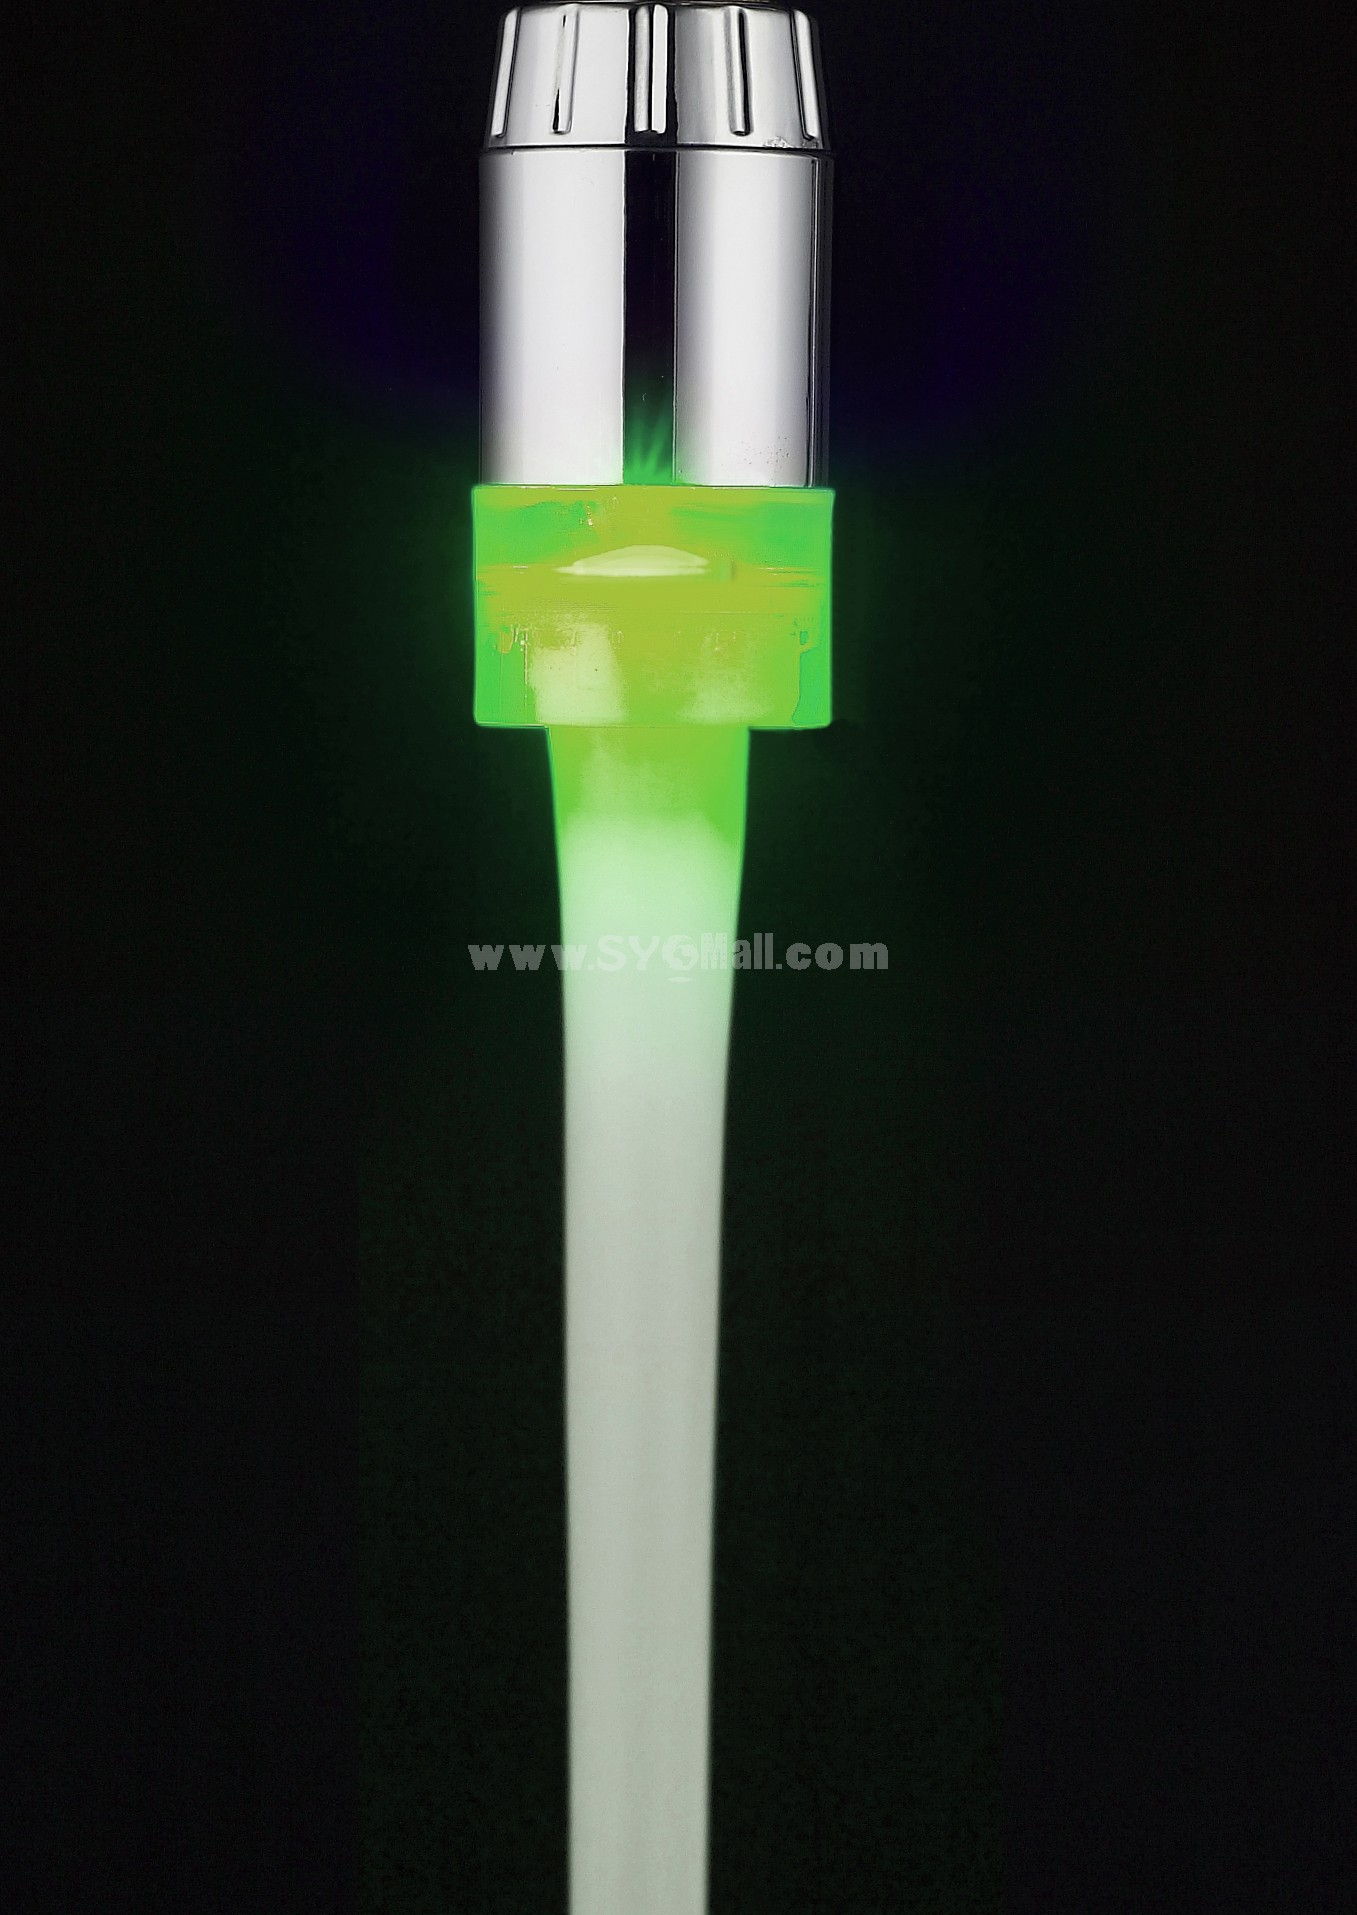 Romantic Bright Color LED Lights Bubble Faucet Mouth HY-2001W (Temperature Control Changing Color)